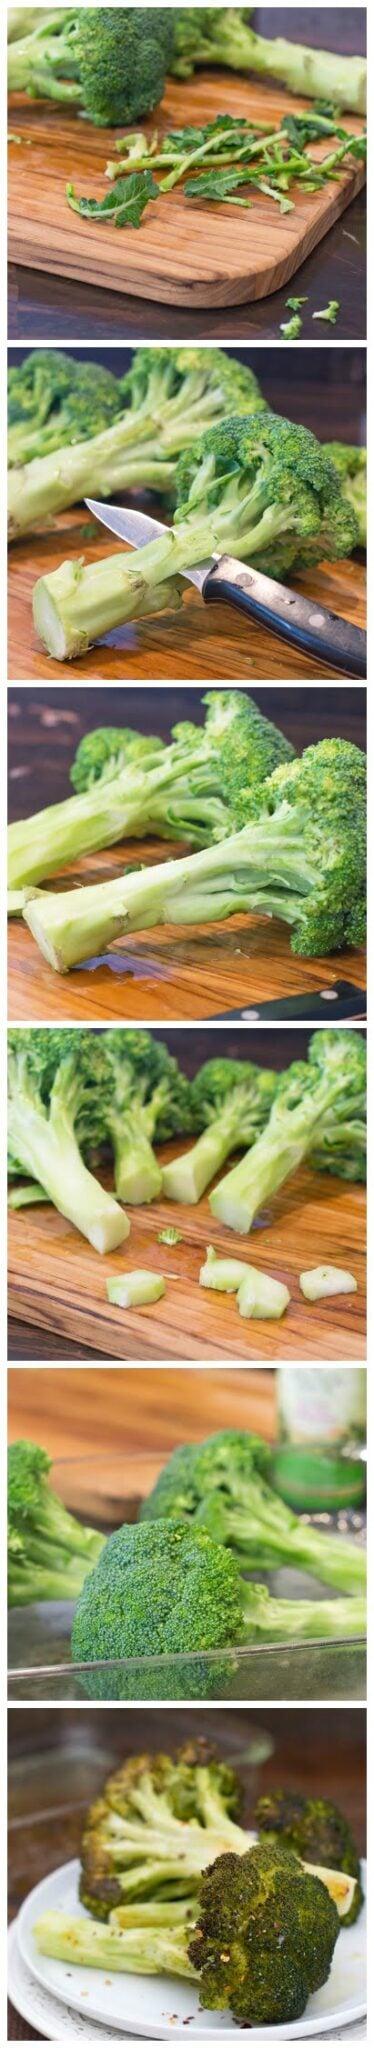 How to peel broccoli to roast it whole